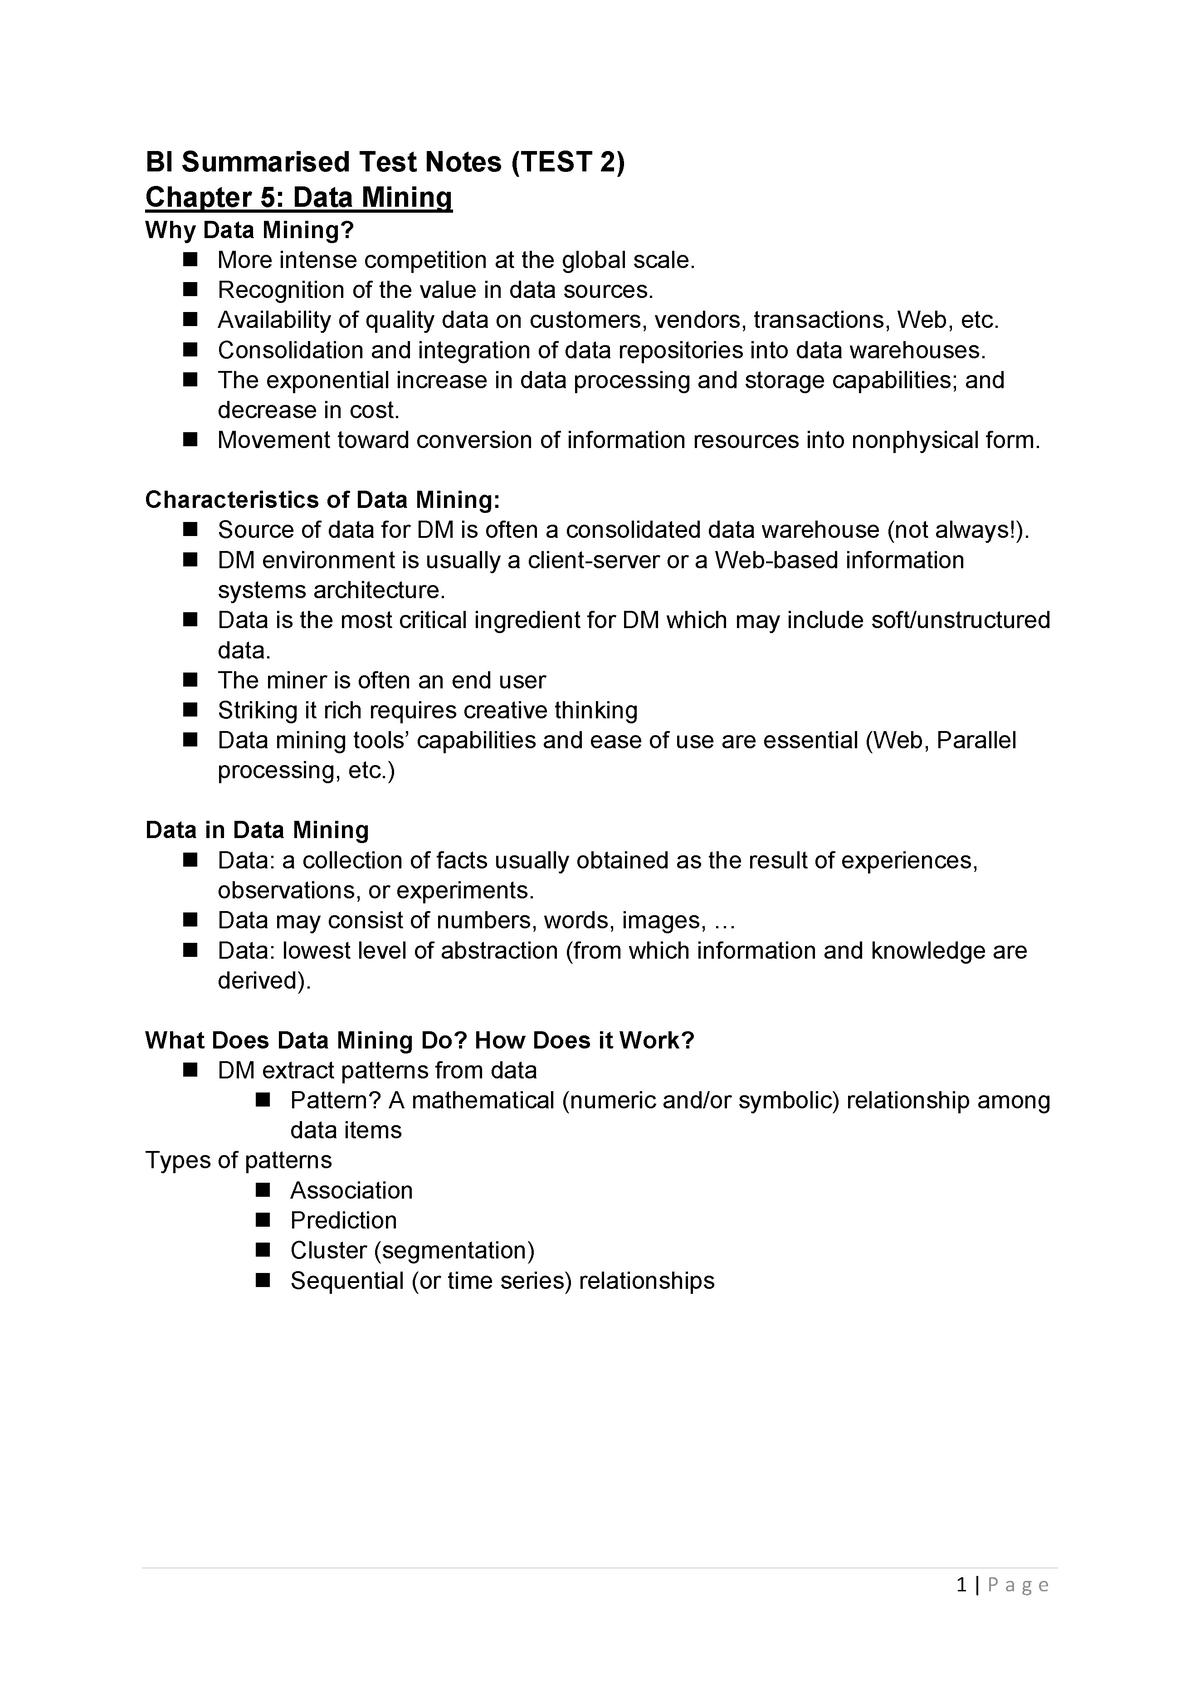 BI Summarised Test Notes - BMI511S - StuDocu